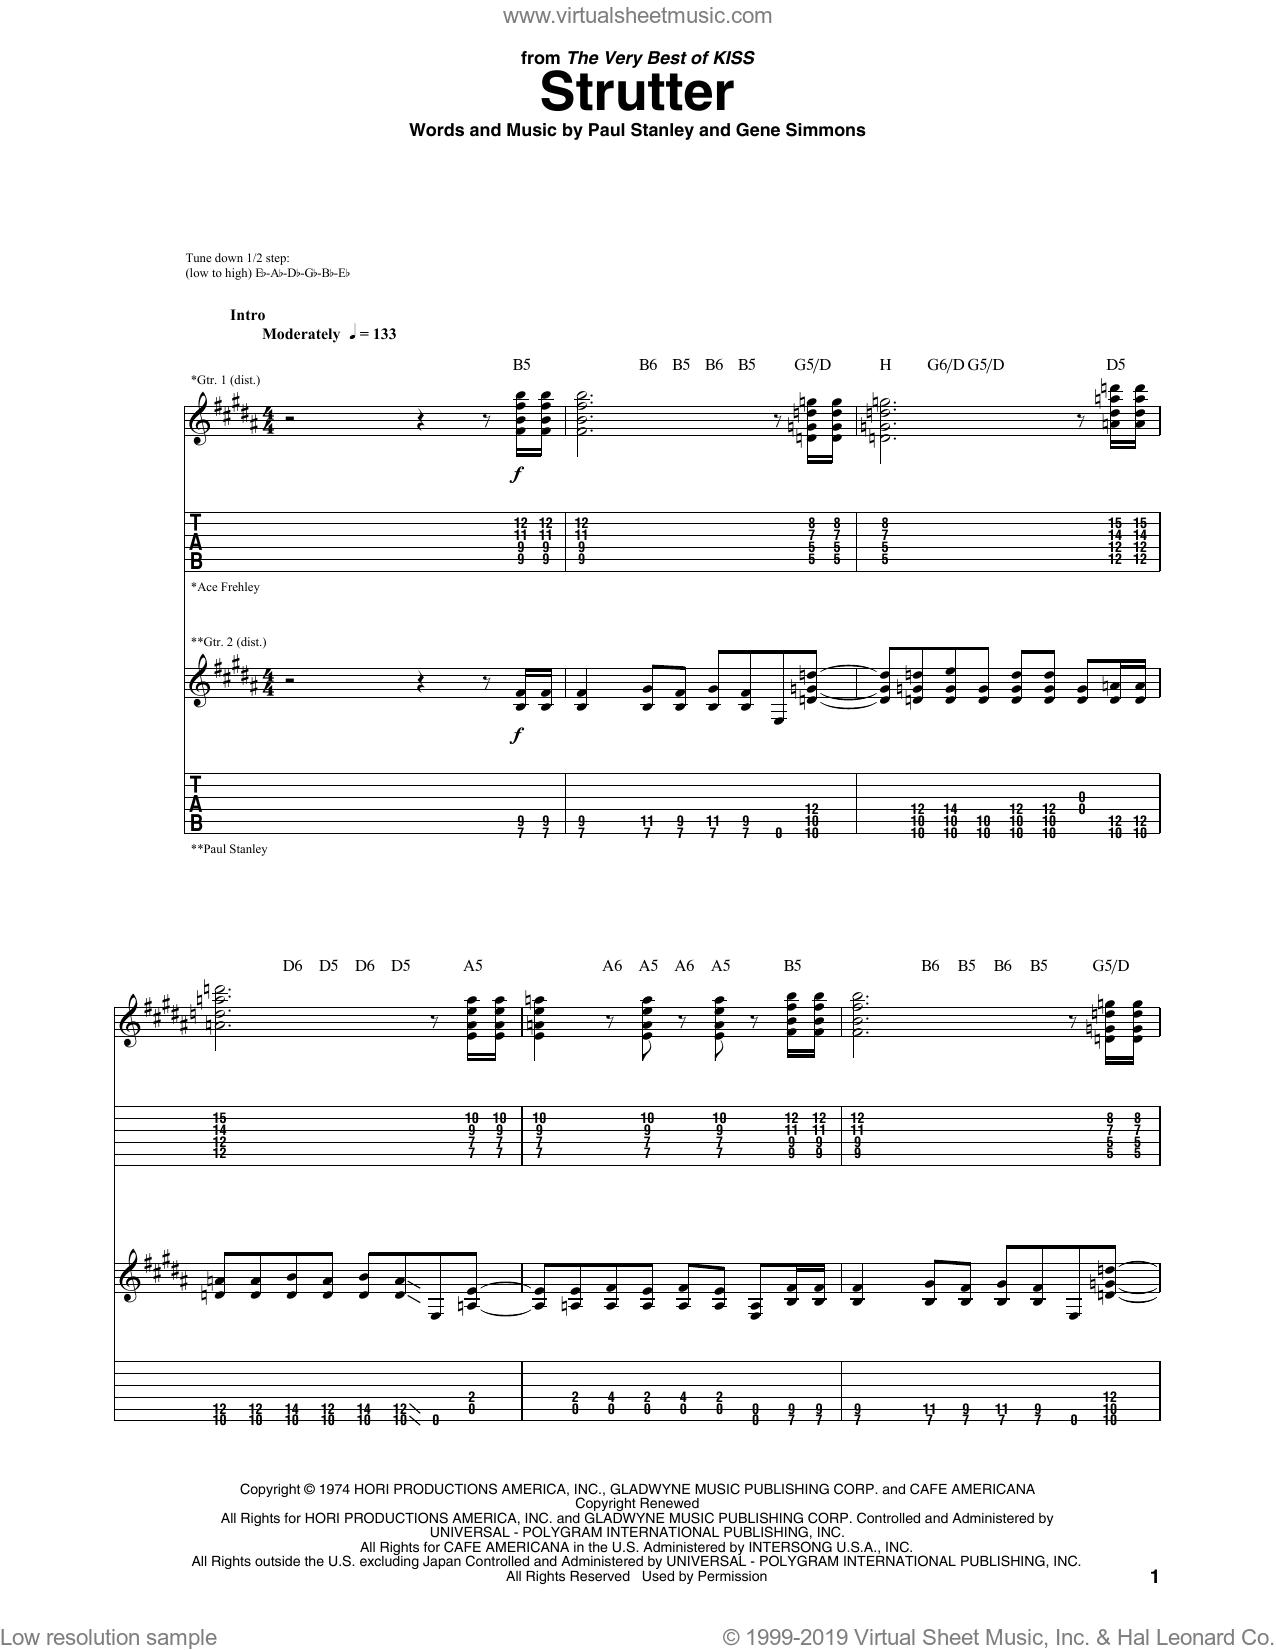 KISS - Strutter sheet music for guitar (tablature) [PDF]